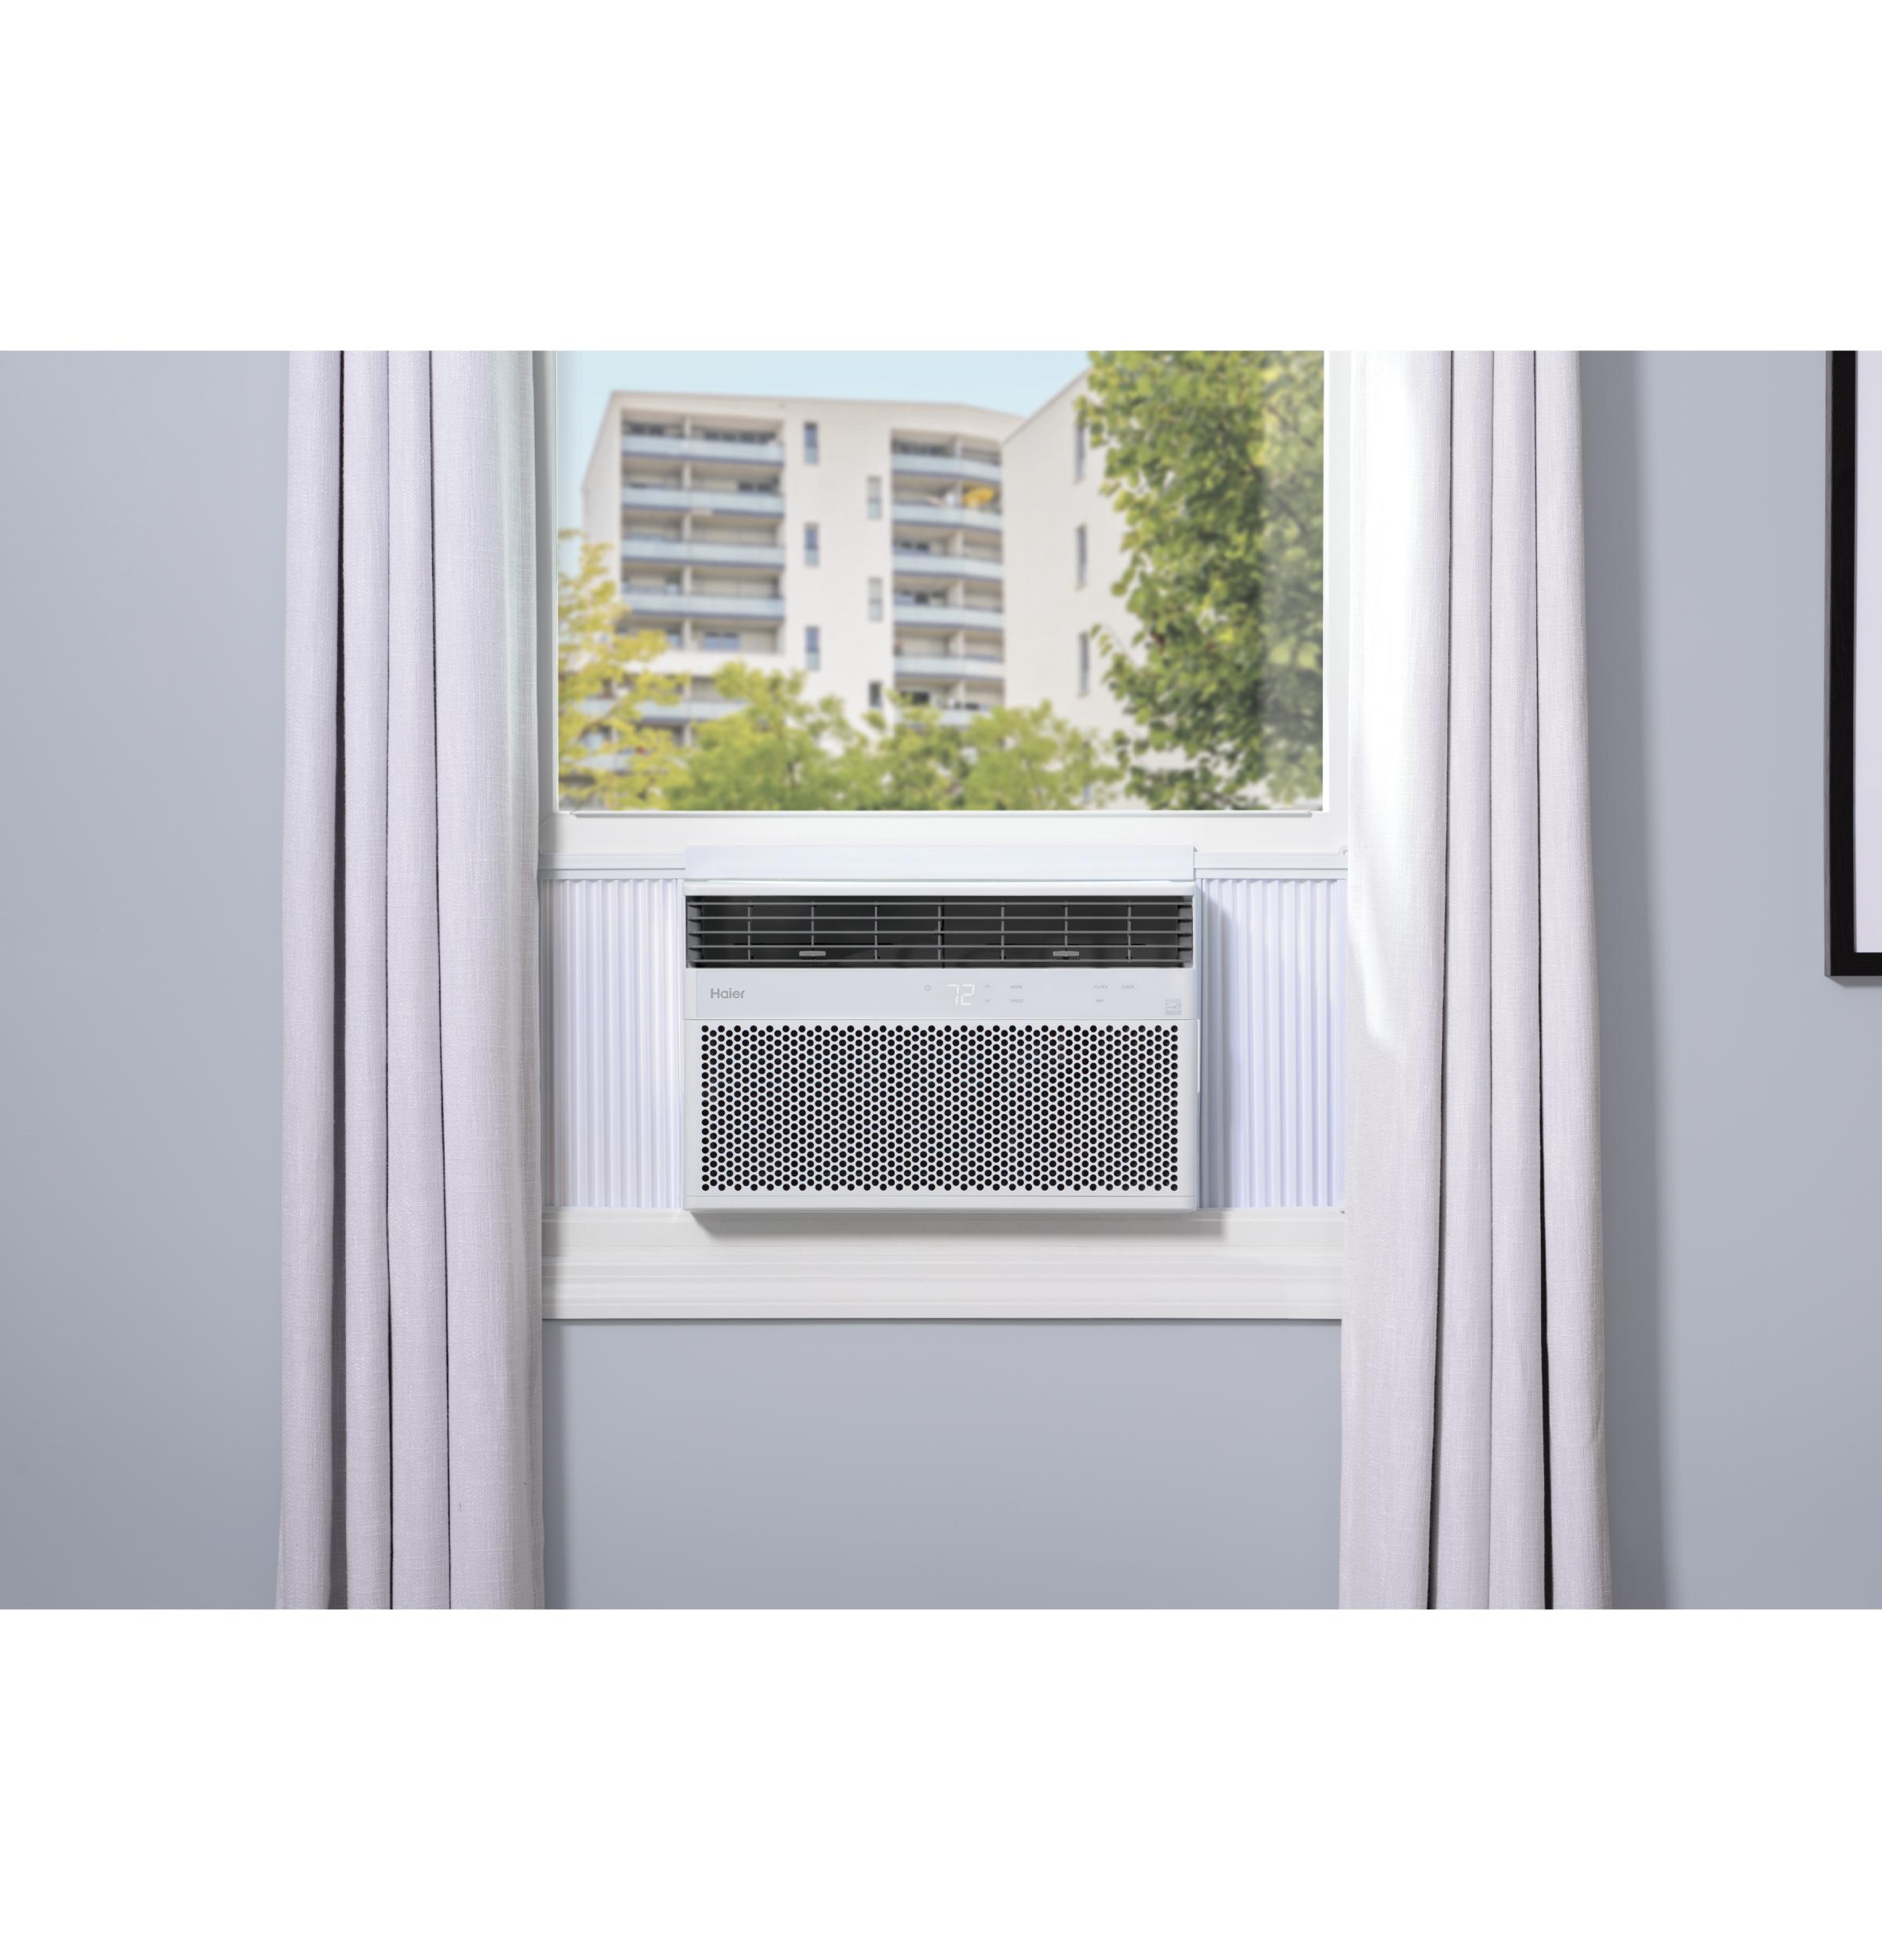 Model: QHEK18AC | Cafe Haier® ENERGY STAR® 18,000/17,800 BTU 230/208 Volt Smart Electronic Window Air Conditioner